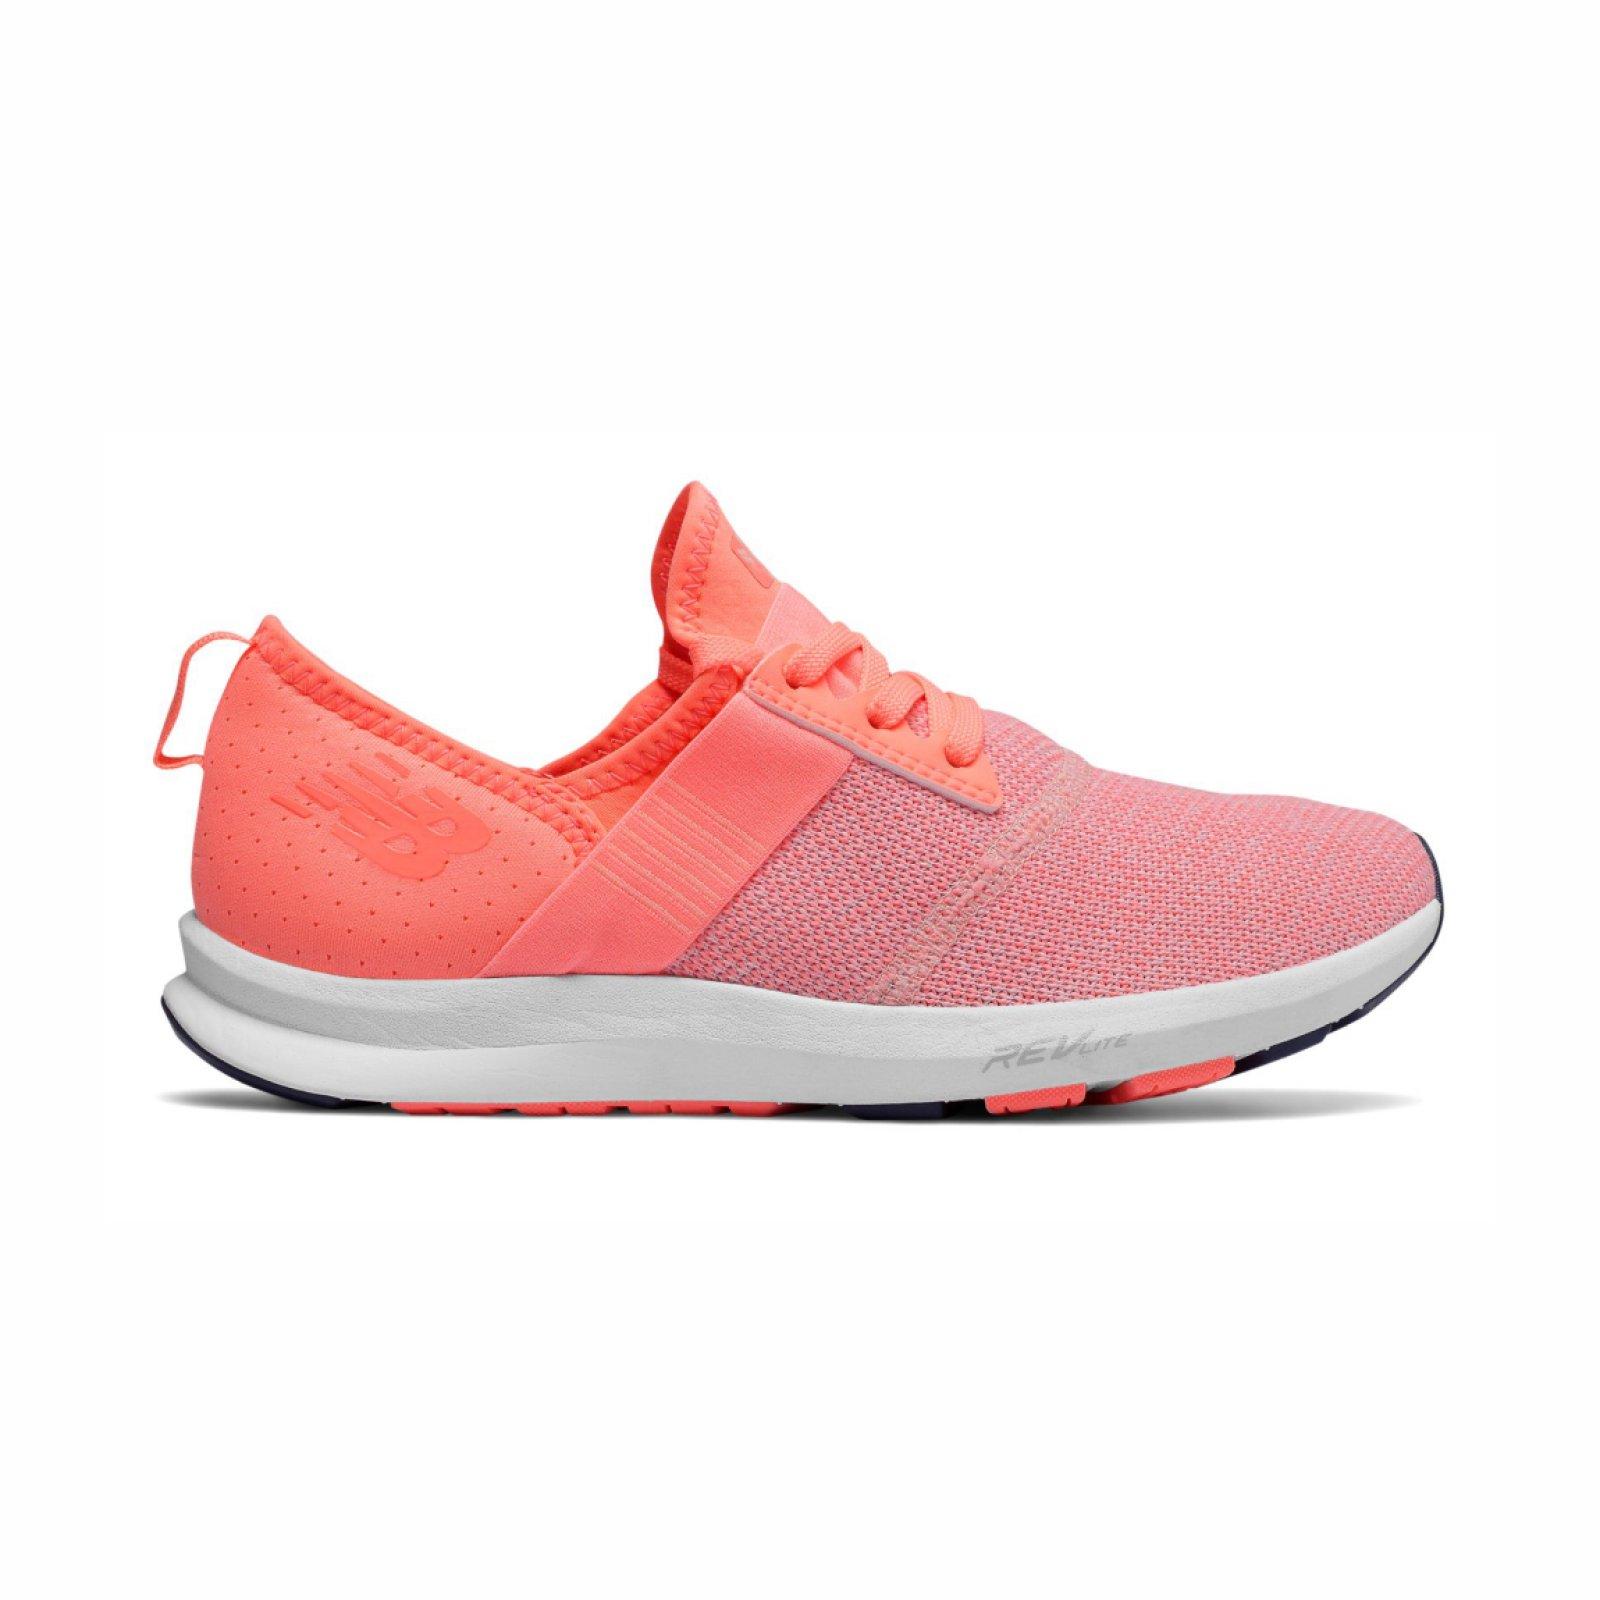 Volnočasové boty New Balance WXNRGFH - Actisport.cz b810114505